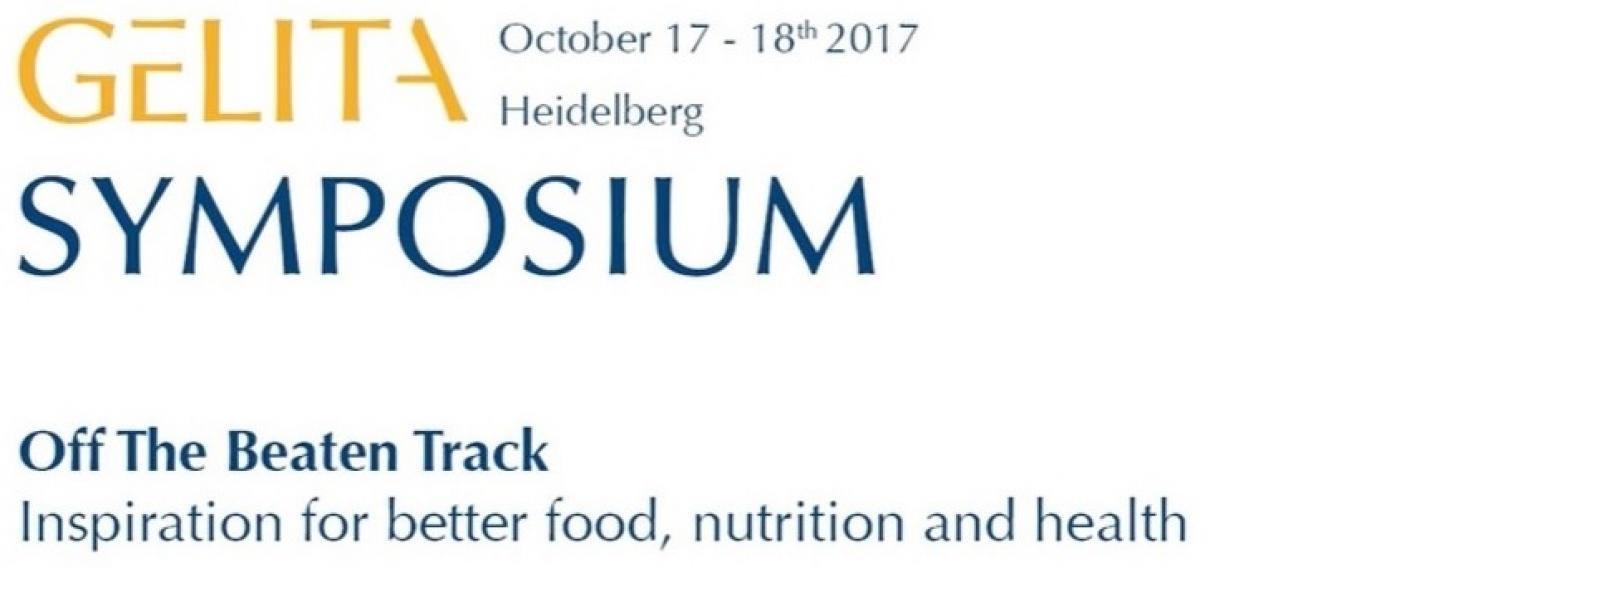 GELITA Symposium Heidelberg 2017